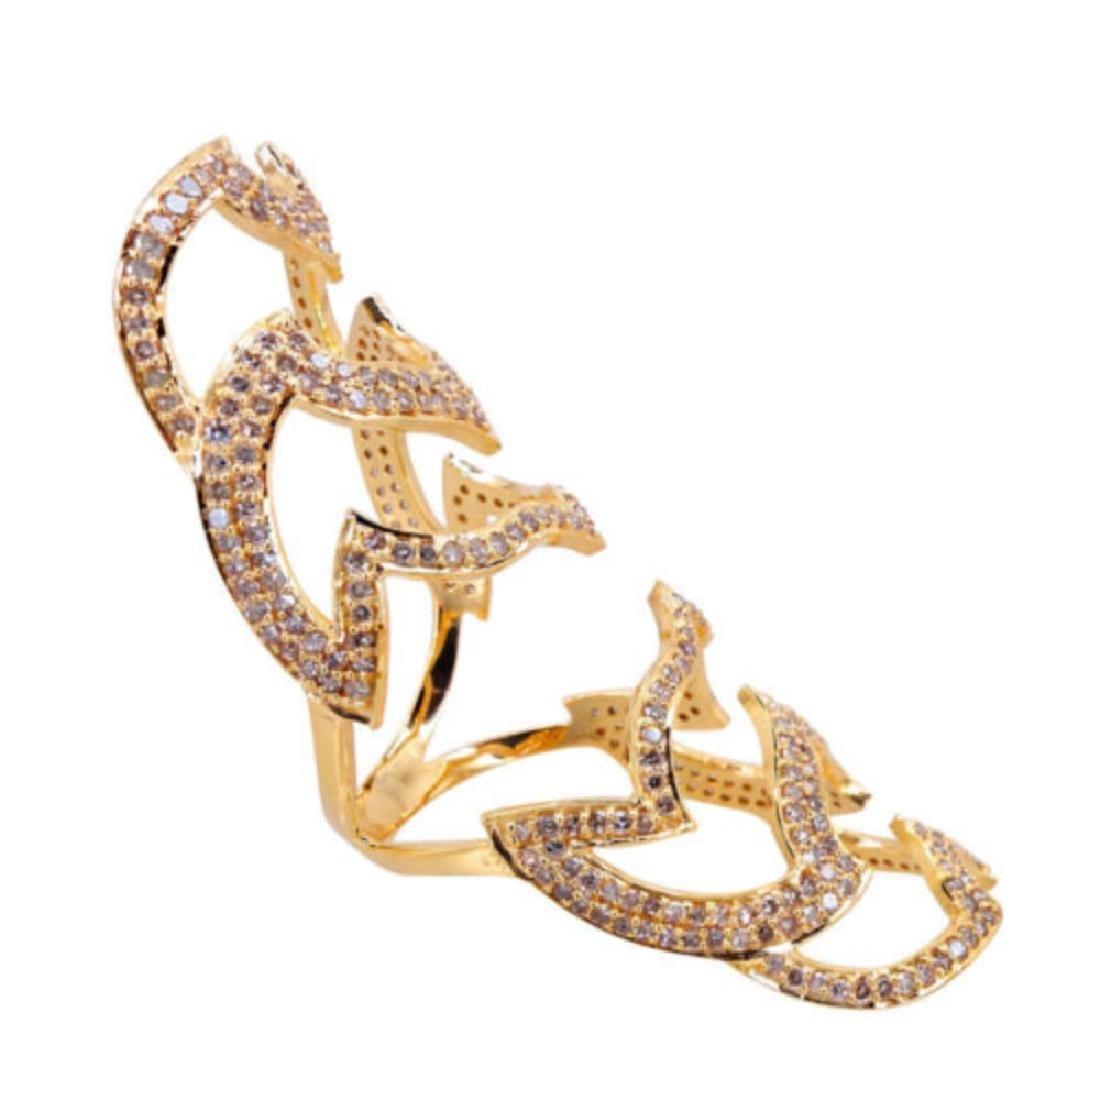 18k Yellow Gold 1.97 Ct Natural Diamond Pave Ring - 2